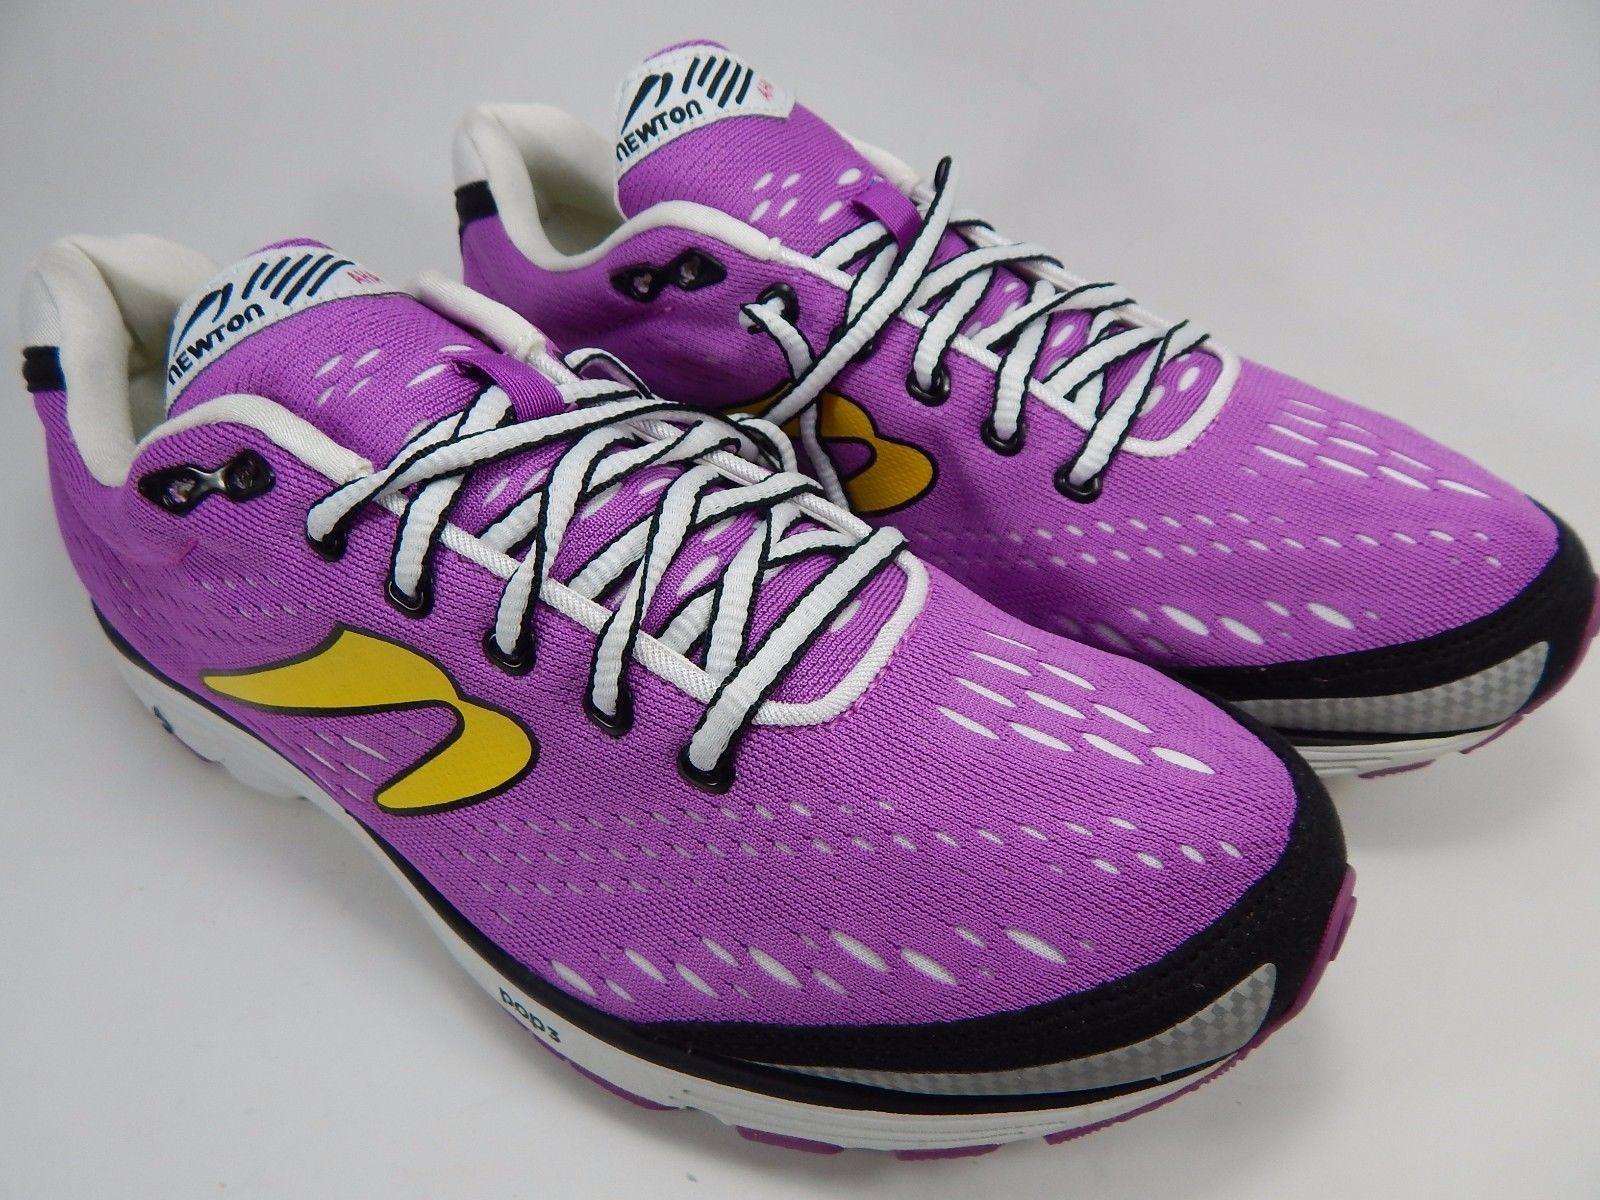 Newton AHA Women's Running Shoes Size US 10.5 M (B) EU 42 Purple W004214B